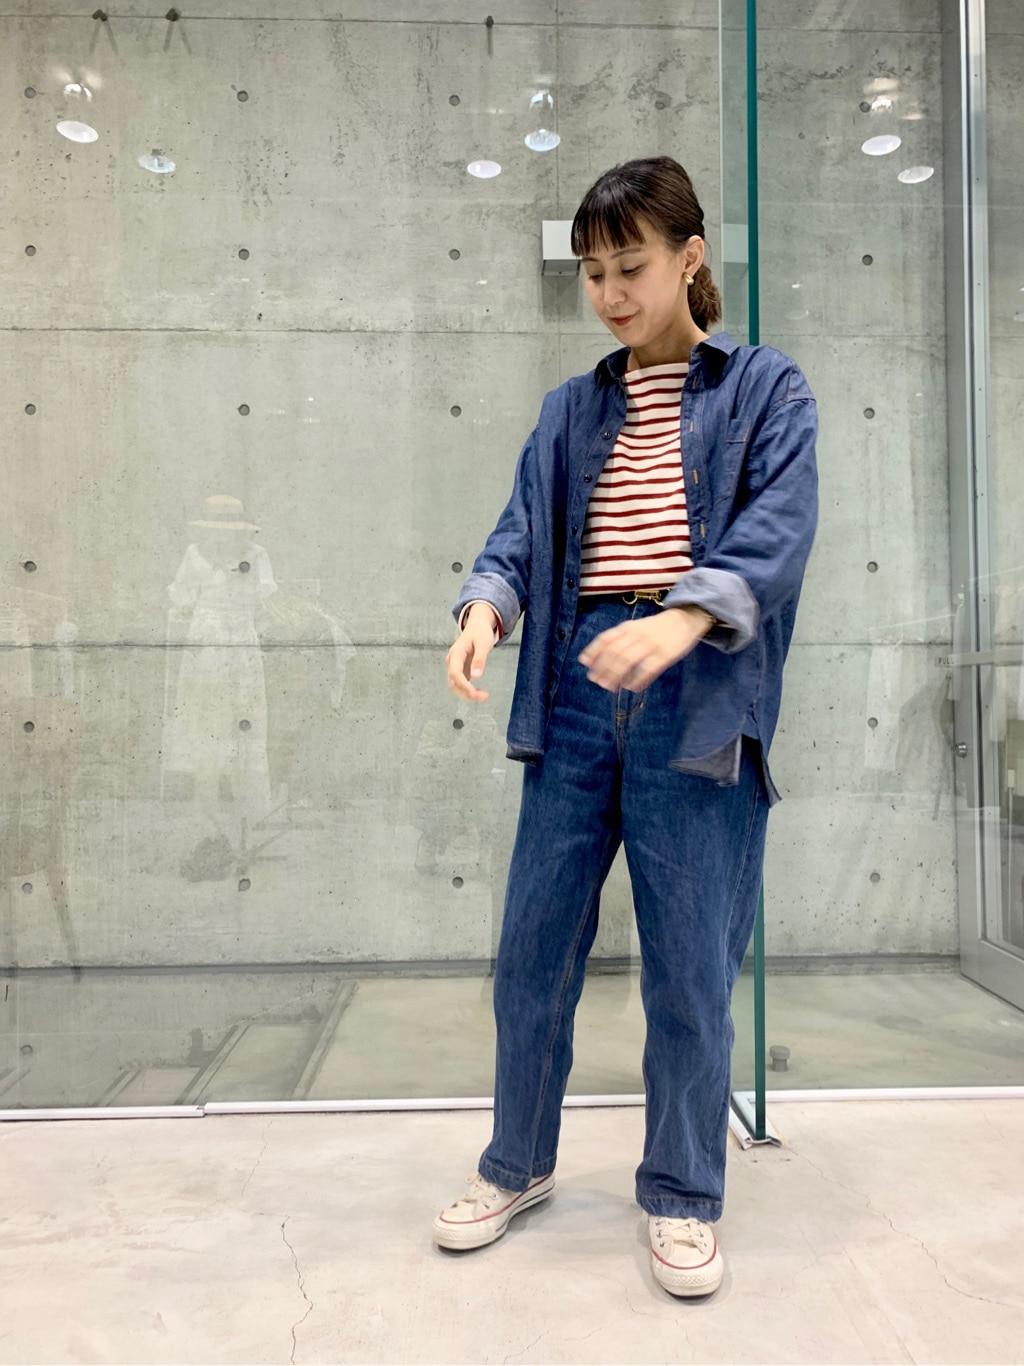 Dot and Stripes CHILD WOMAN ルミネ池袋 身長:155cm 2020.04.11